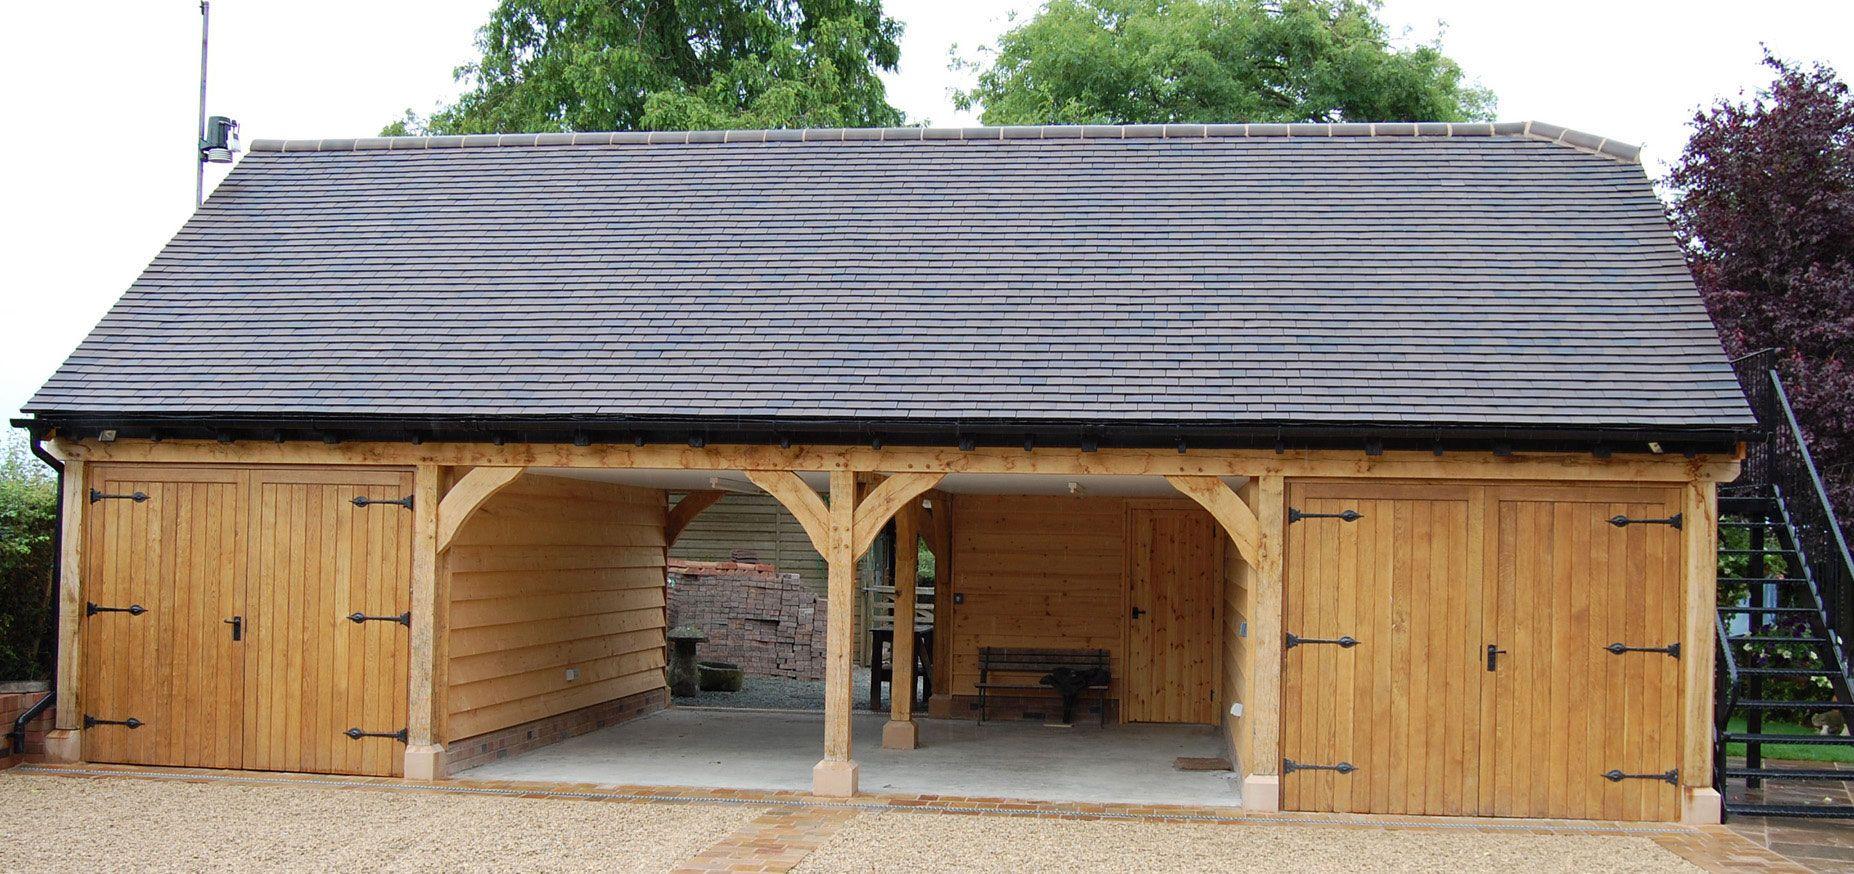 Oak Framed Garage - Google Search